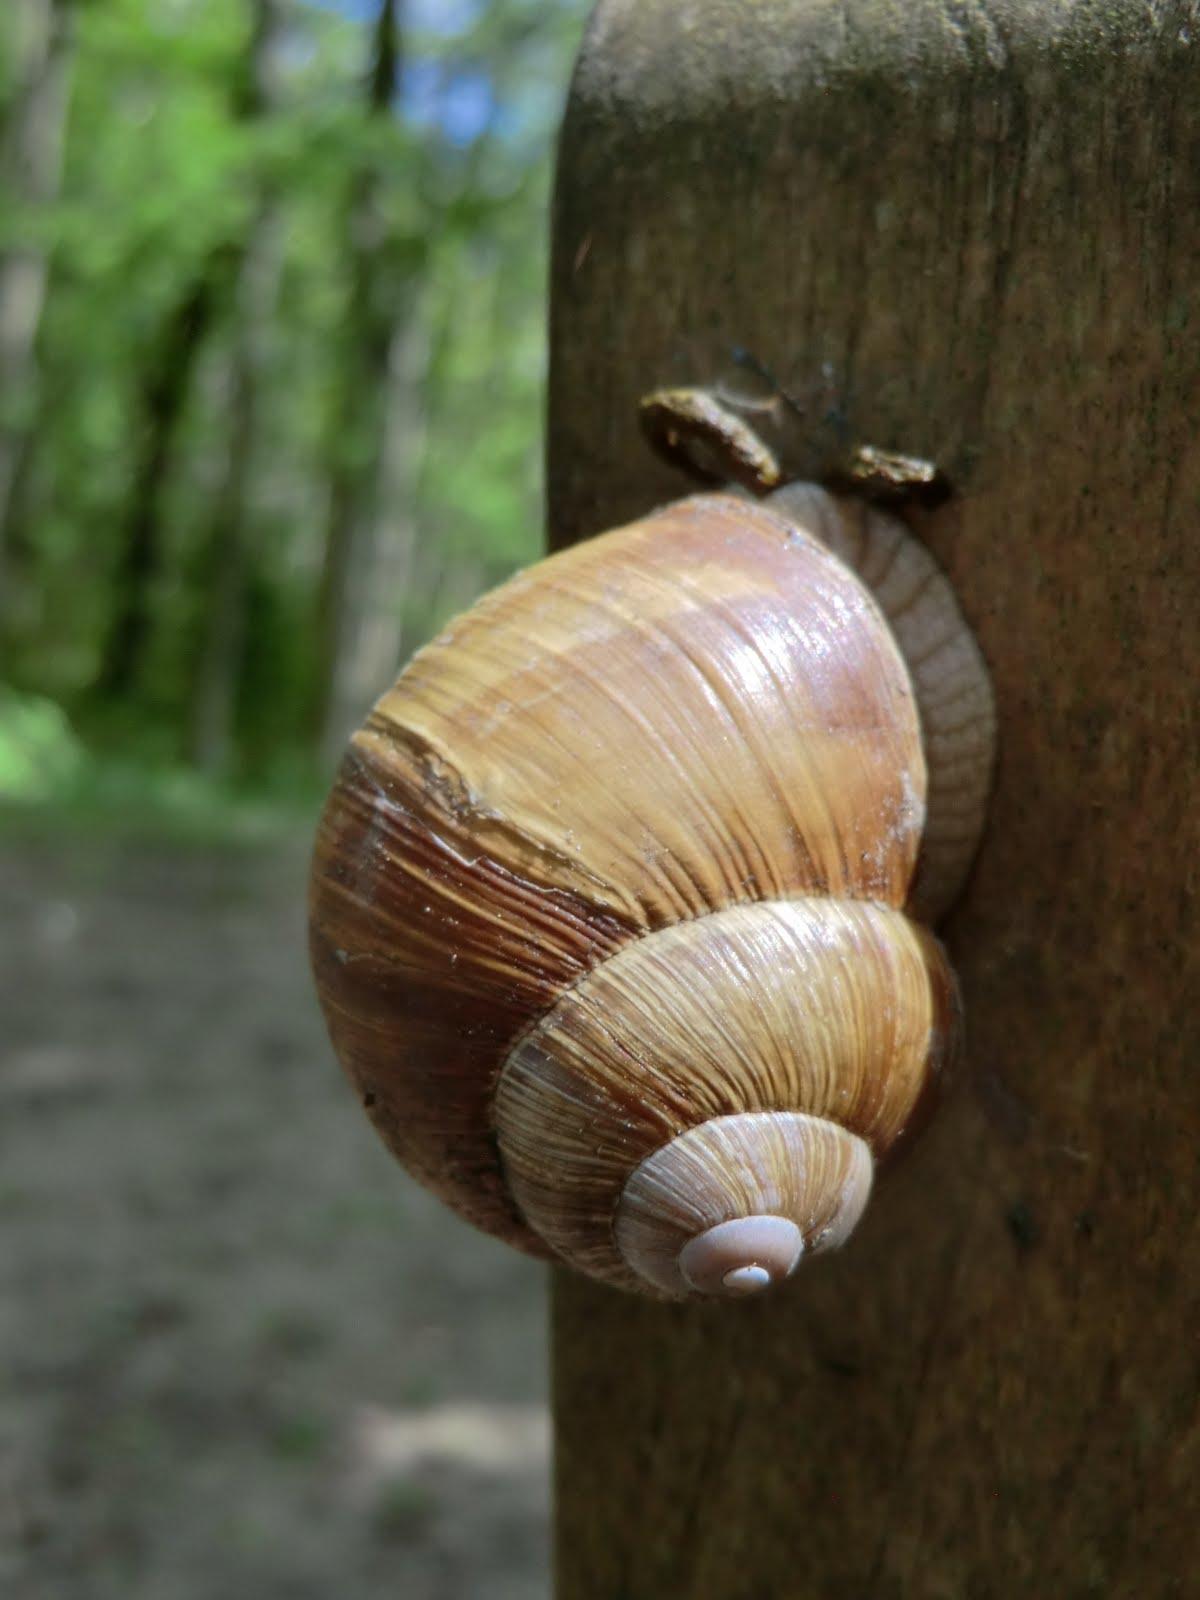 CIMG8147 A Roman snail on its way up